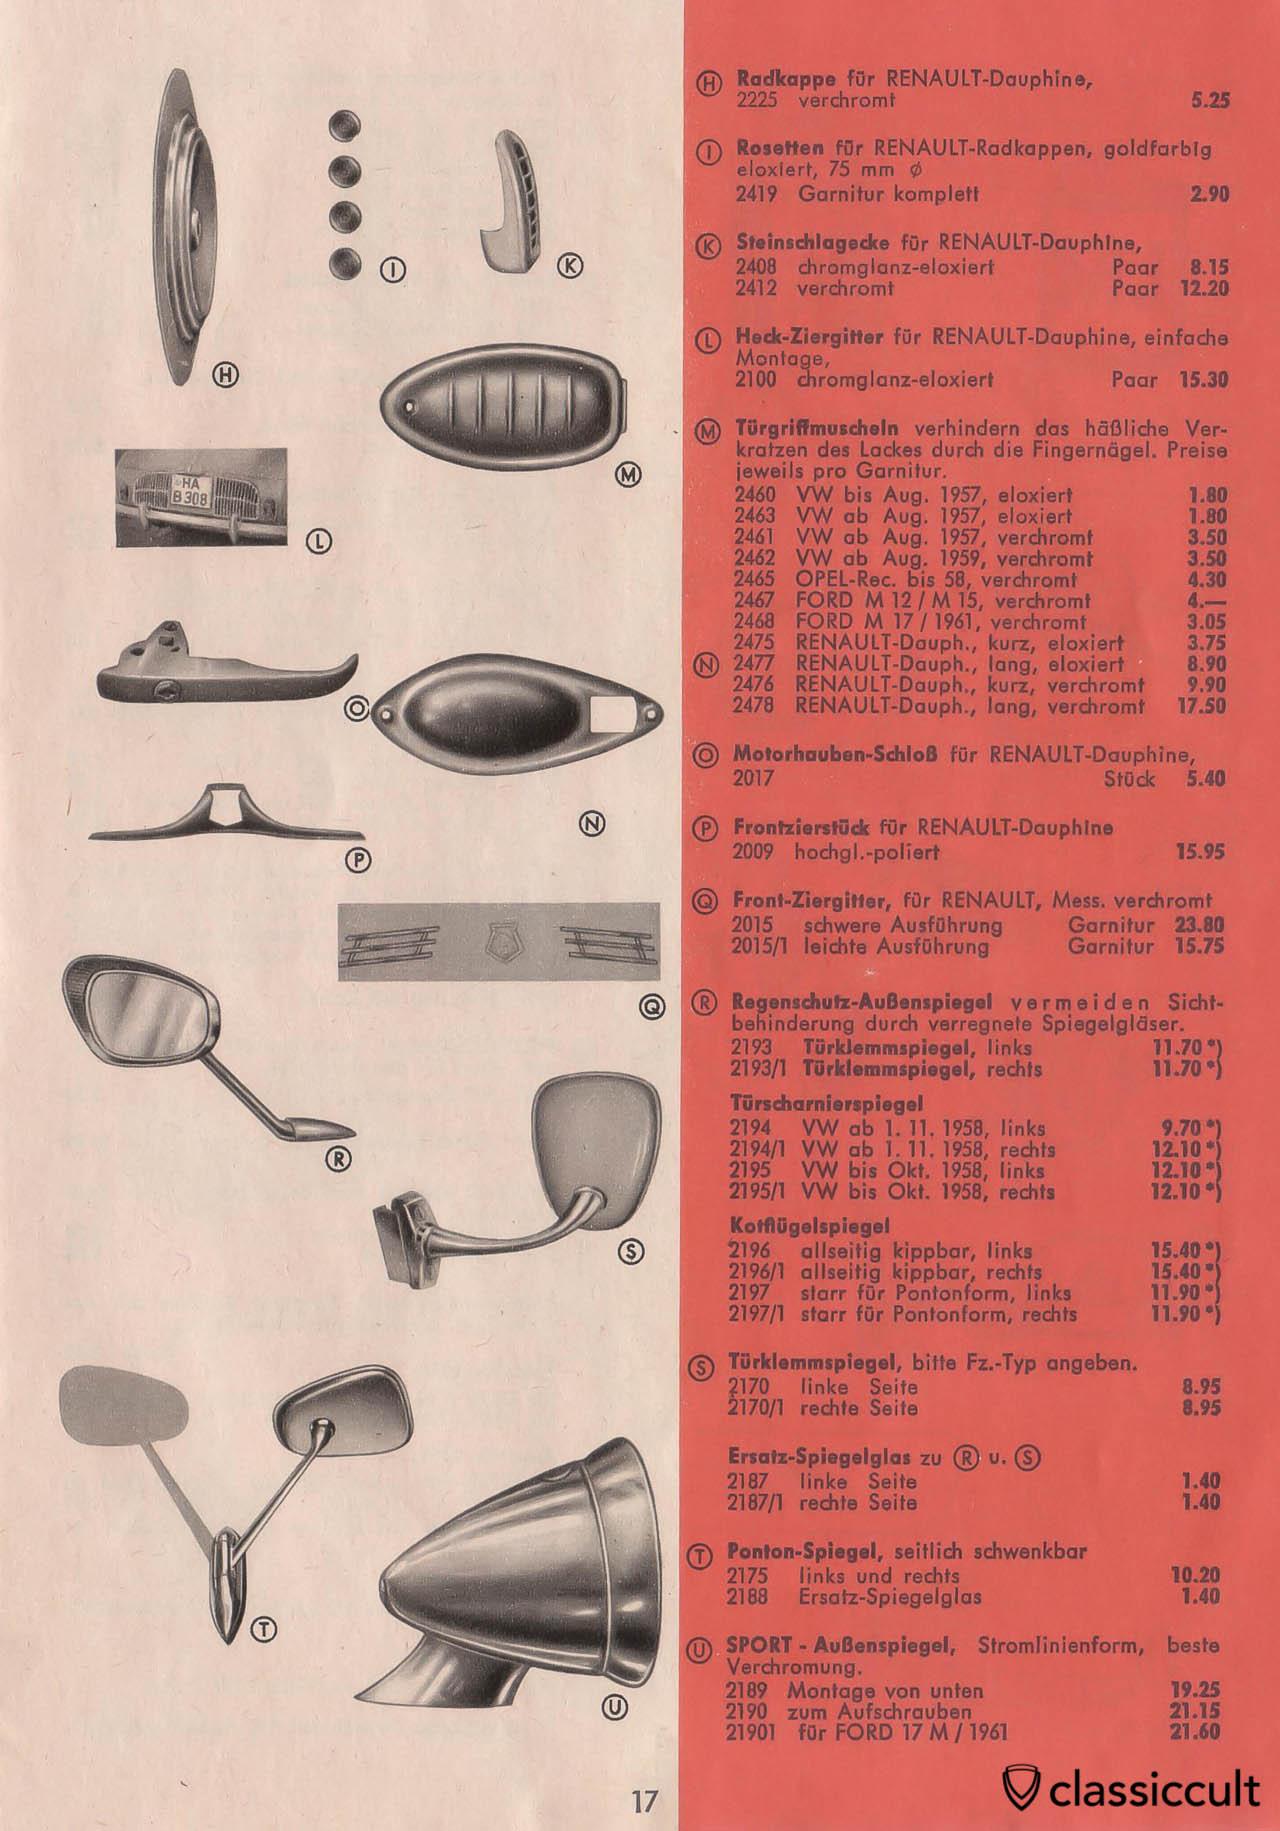 Vintage Vw Beetle Accessories Catalog 1957 1965 Classiccult